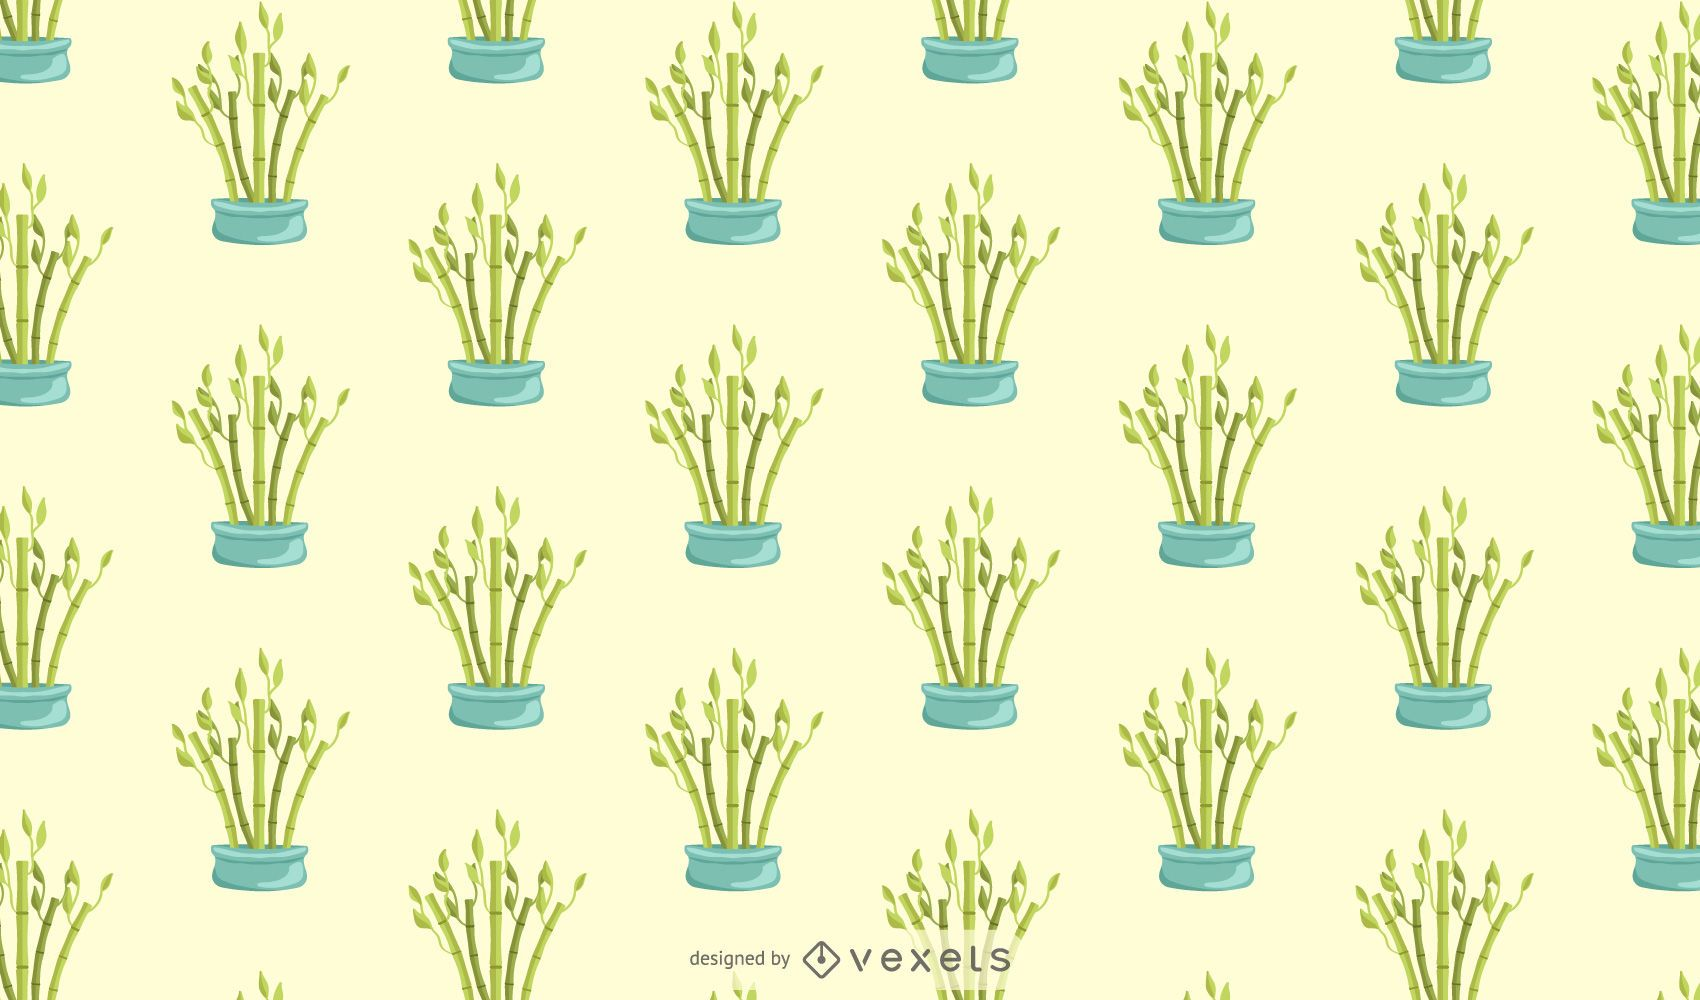 Lucky bamboo pattern design